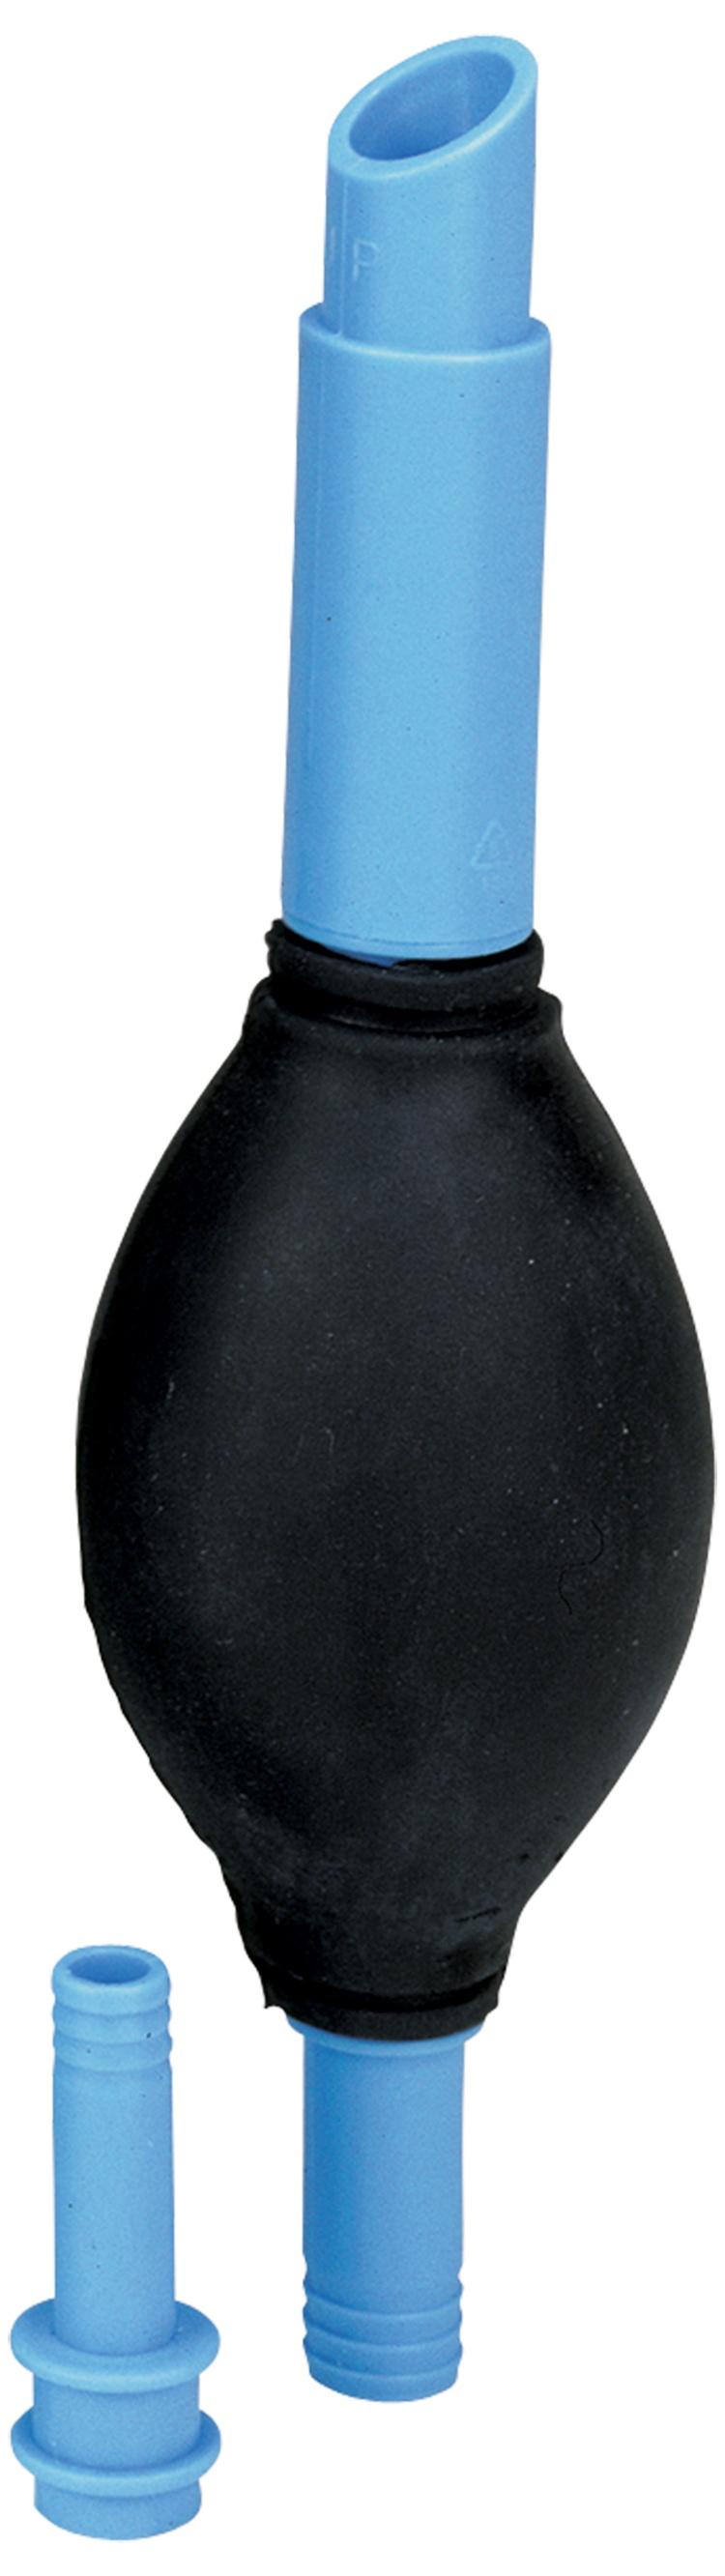 Aksesuārs akvārijam - Sifona sūknis